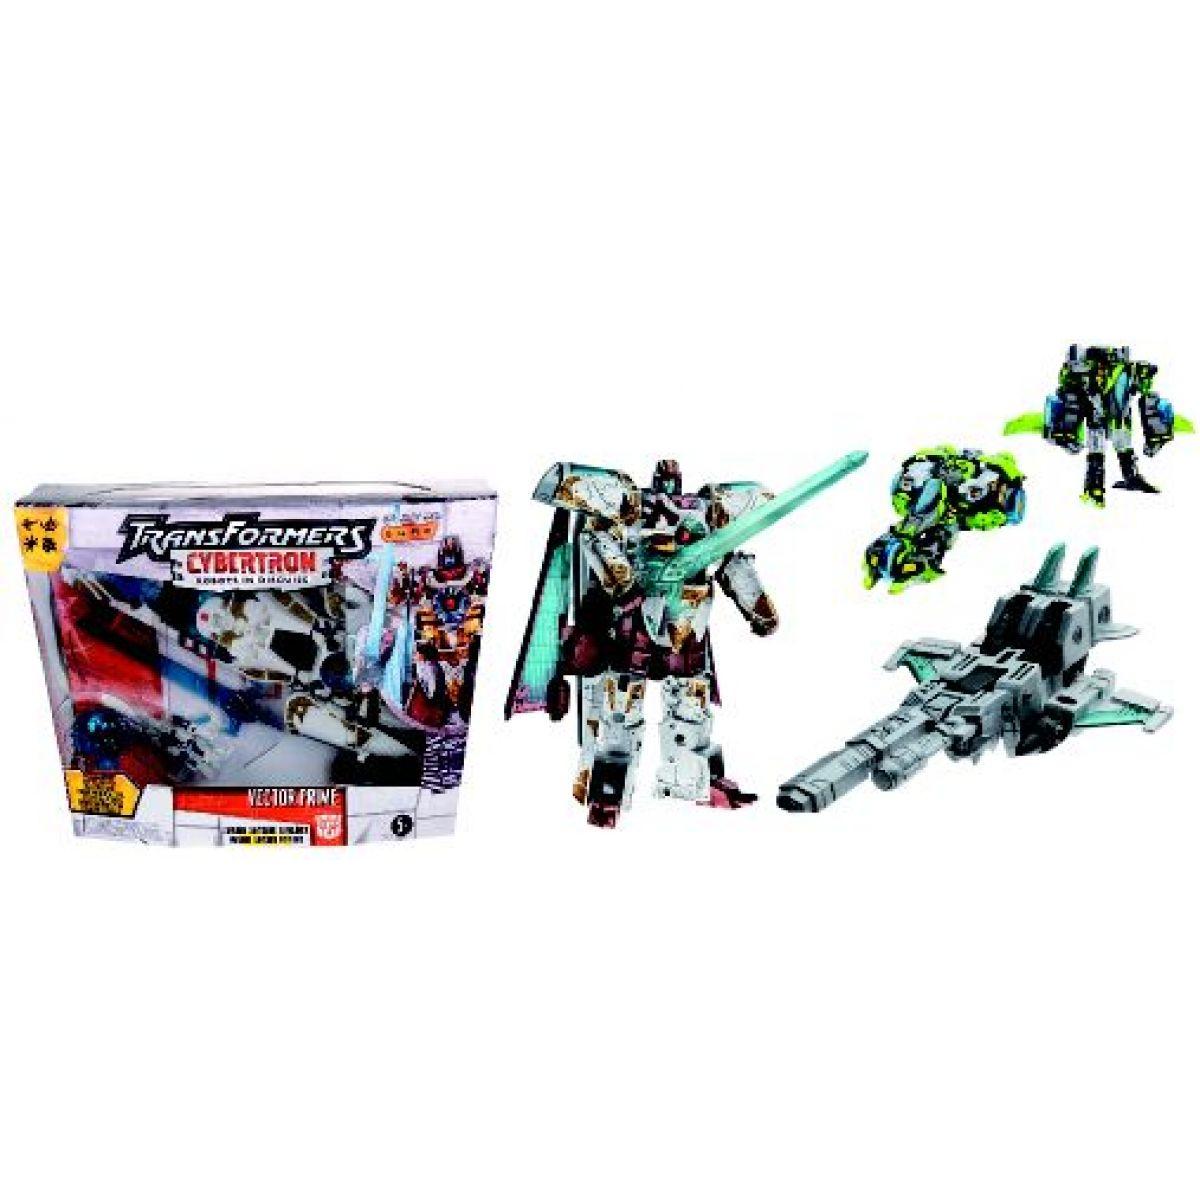 Transformers Cybertron Voyager